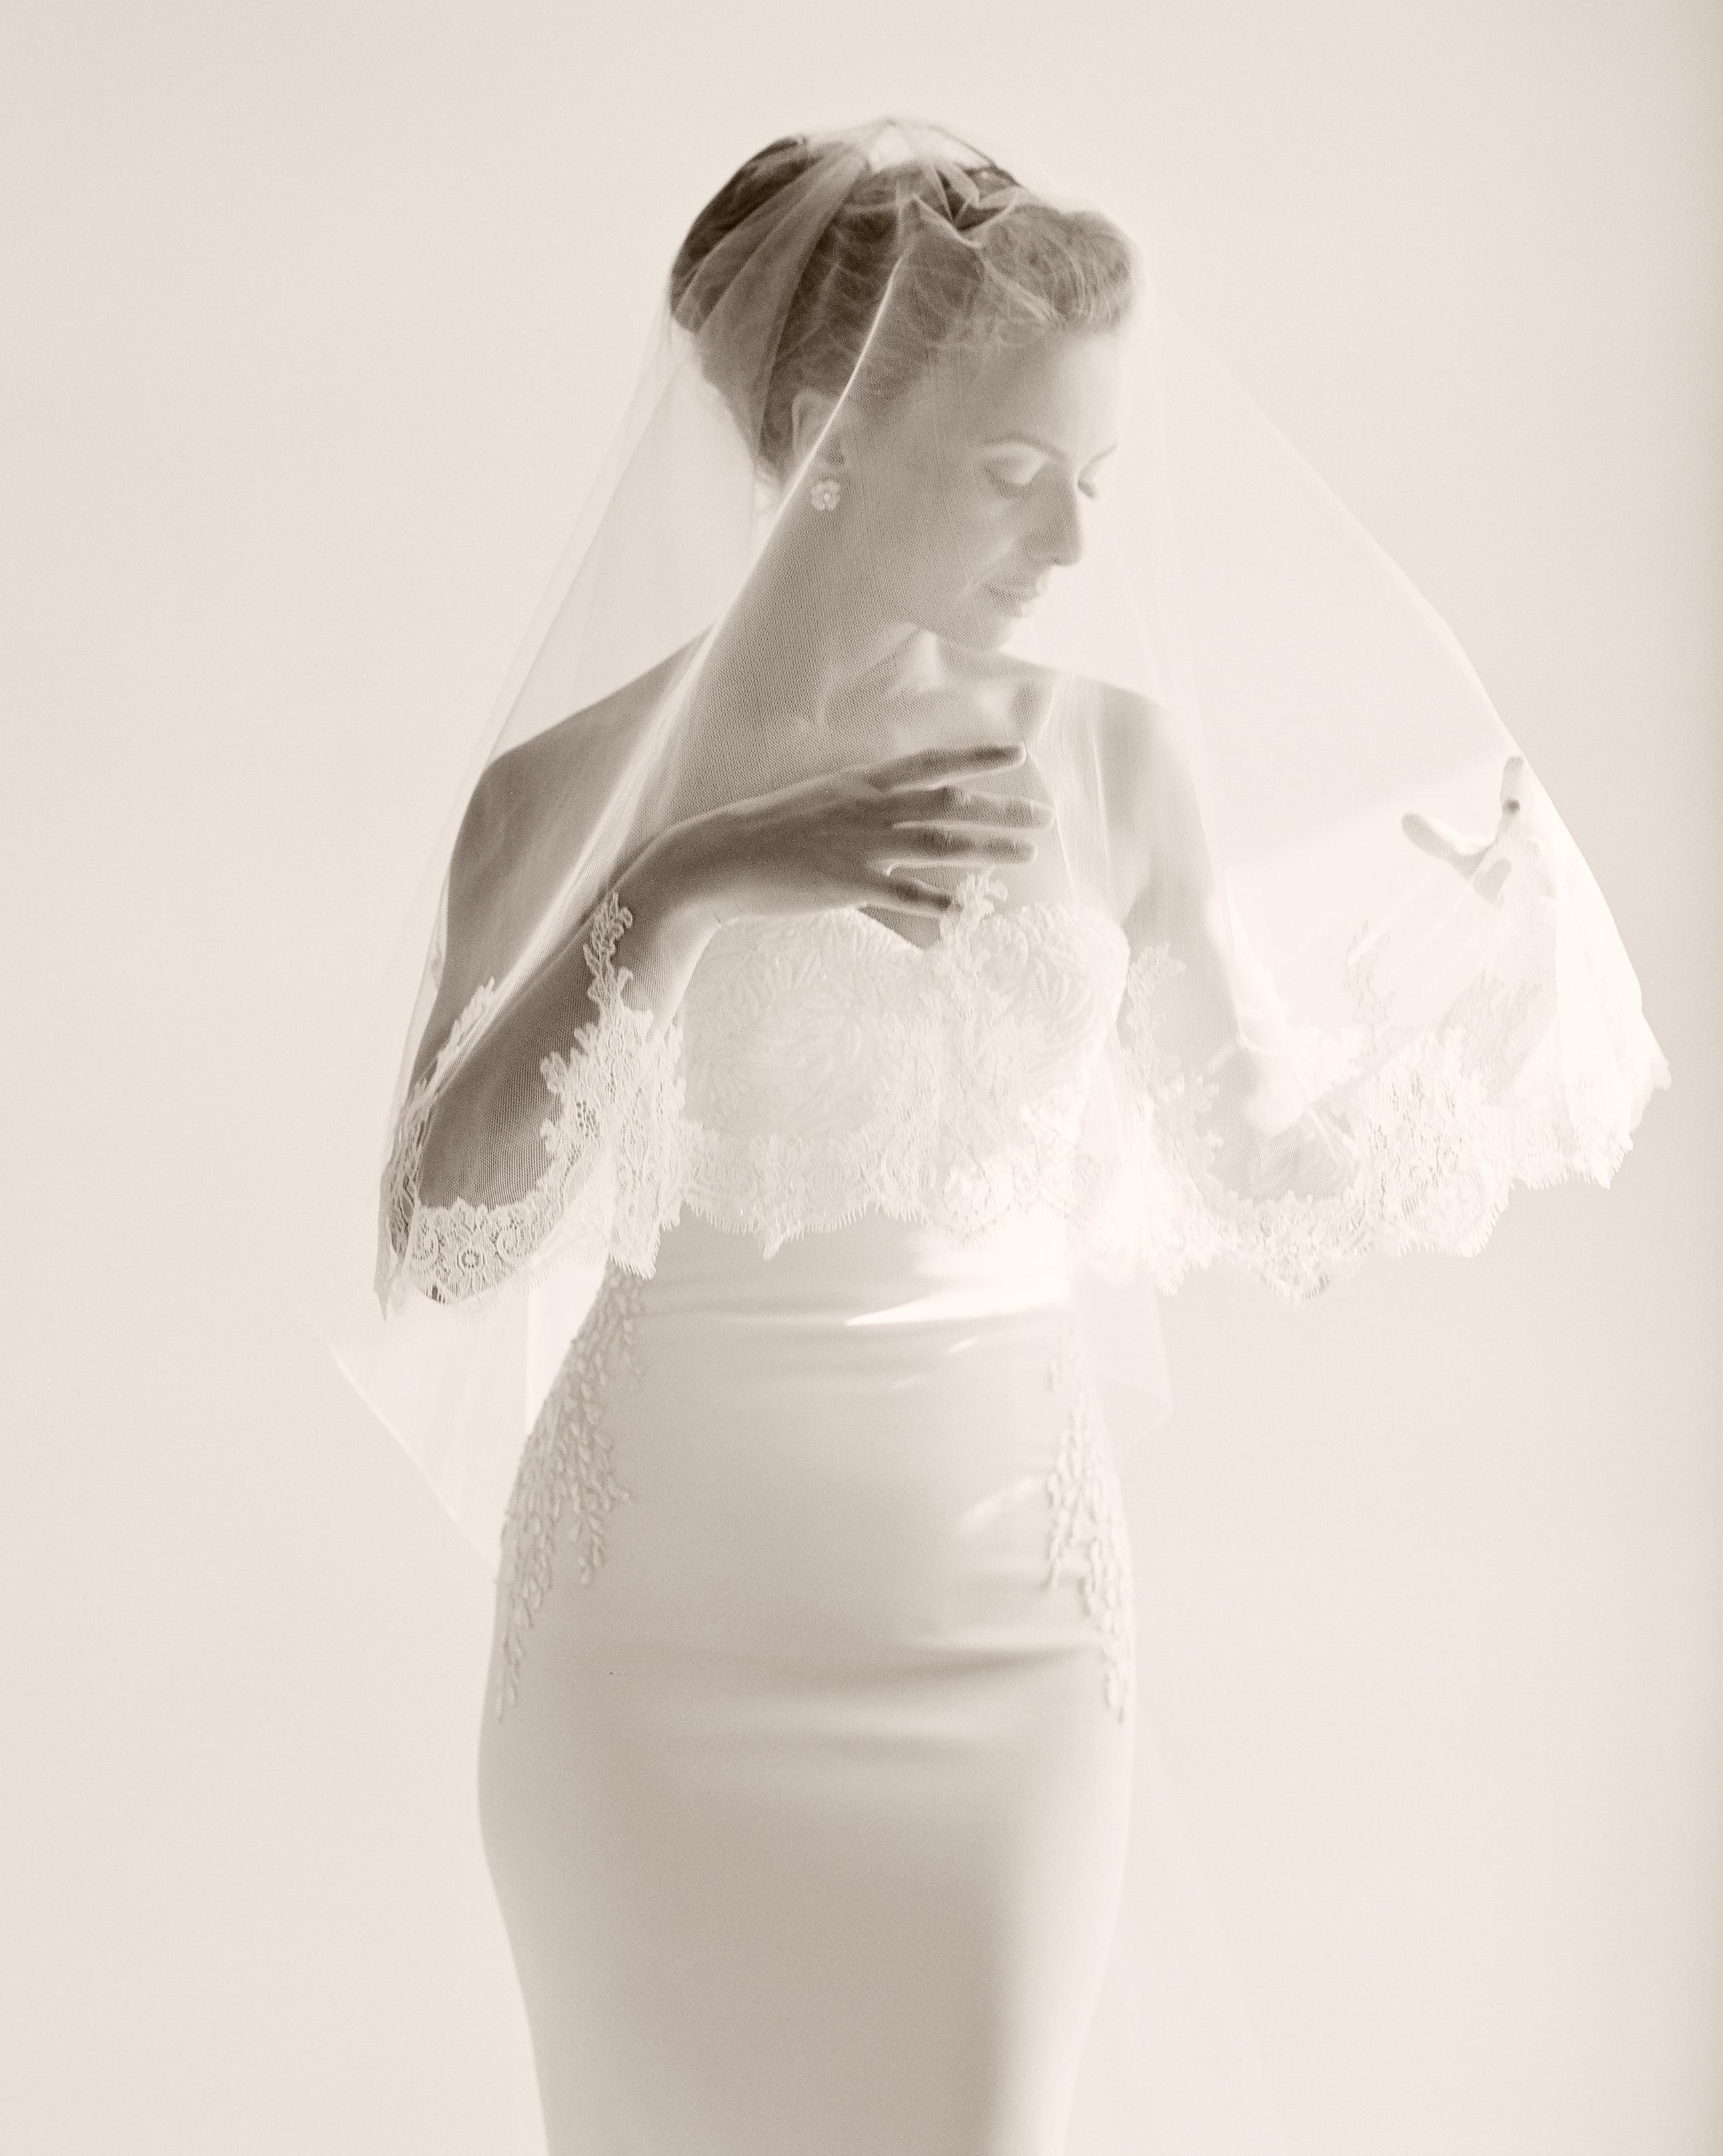 real-wedding-fall14-jojo-eric-001elizabeth-messina-ds111226-0814.jpg